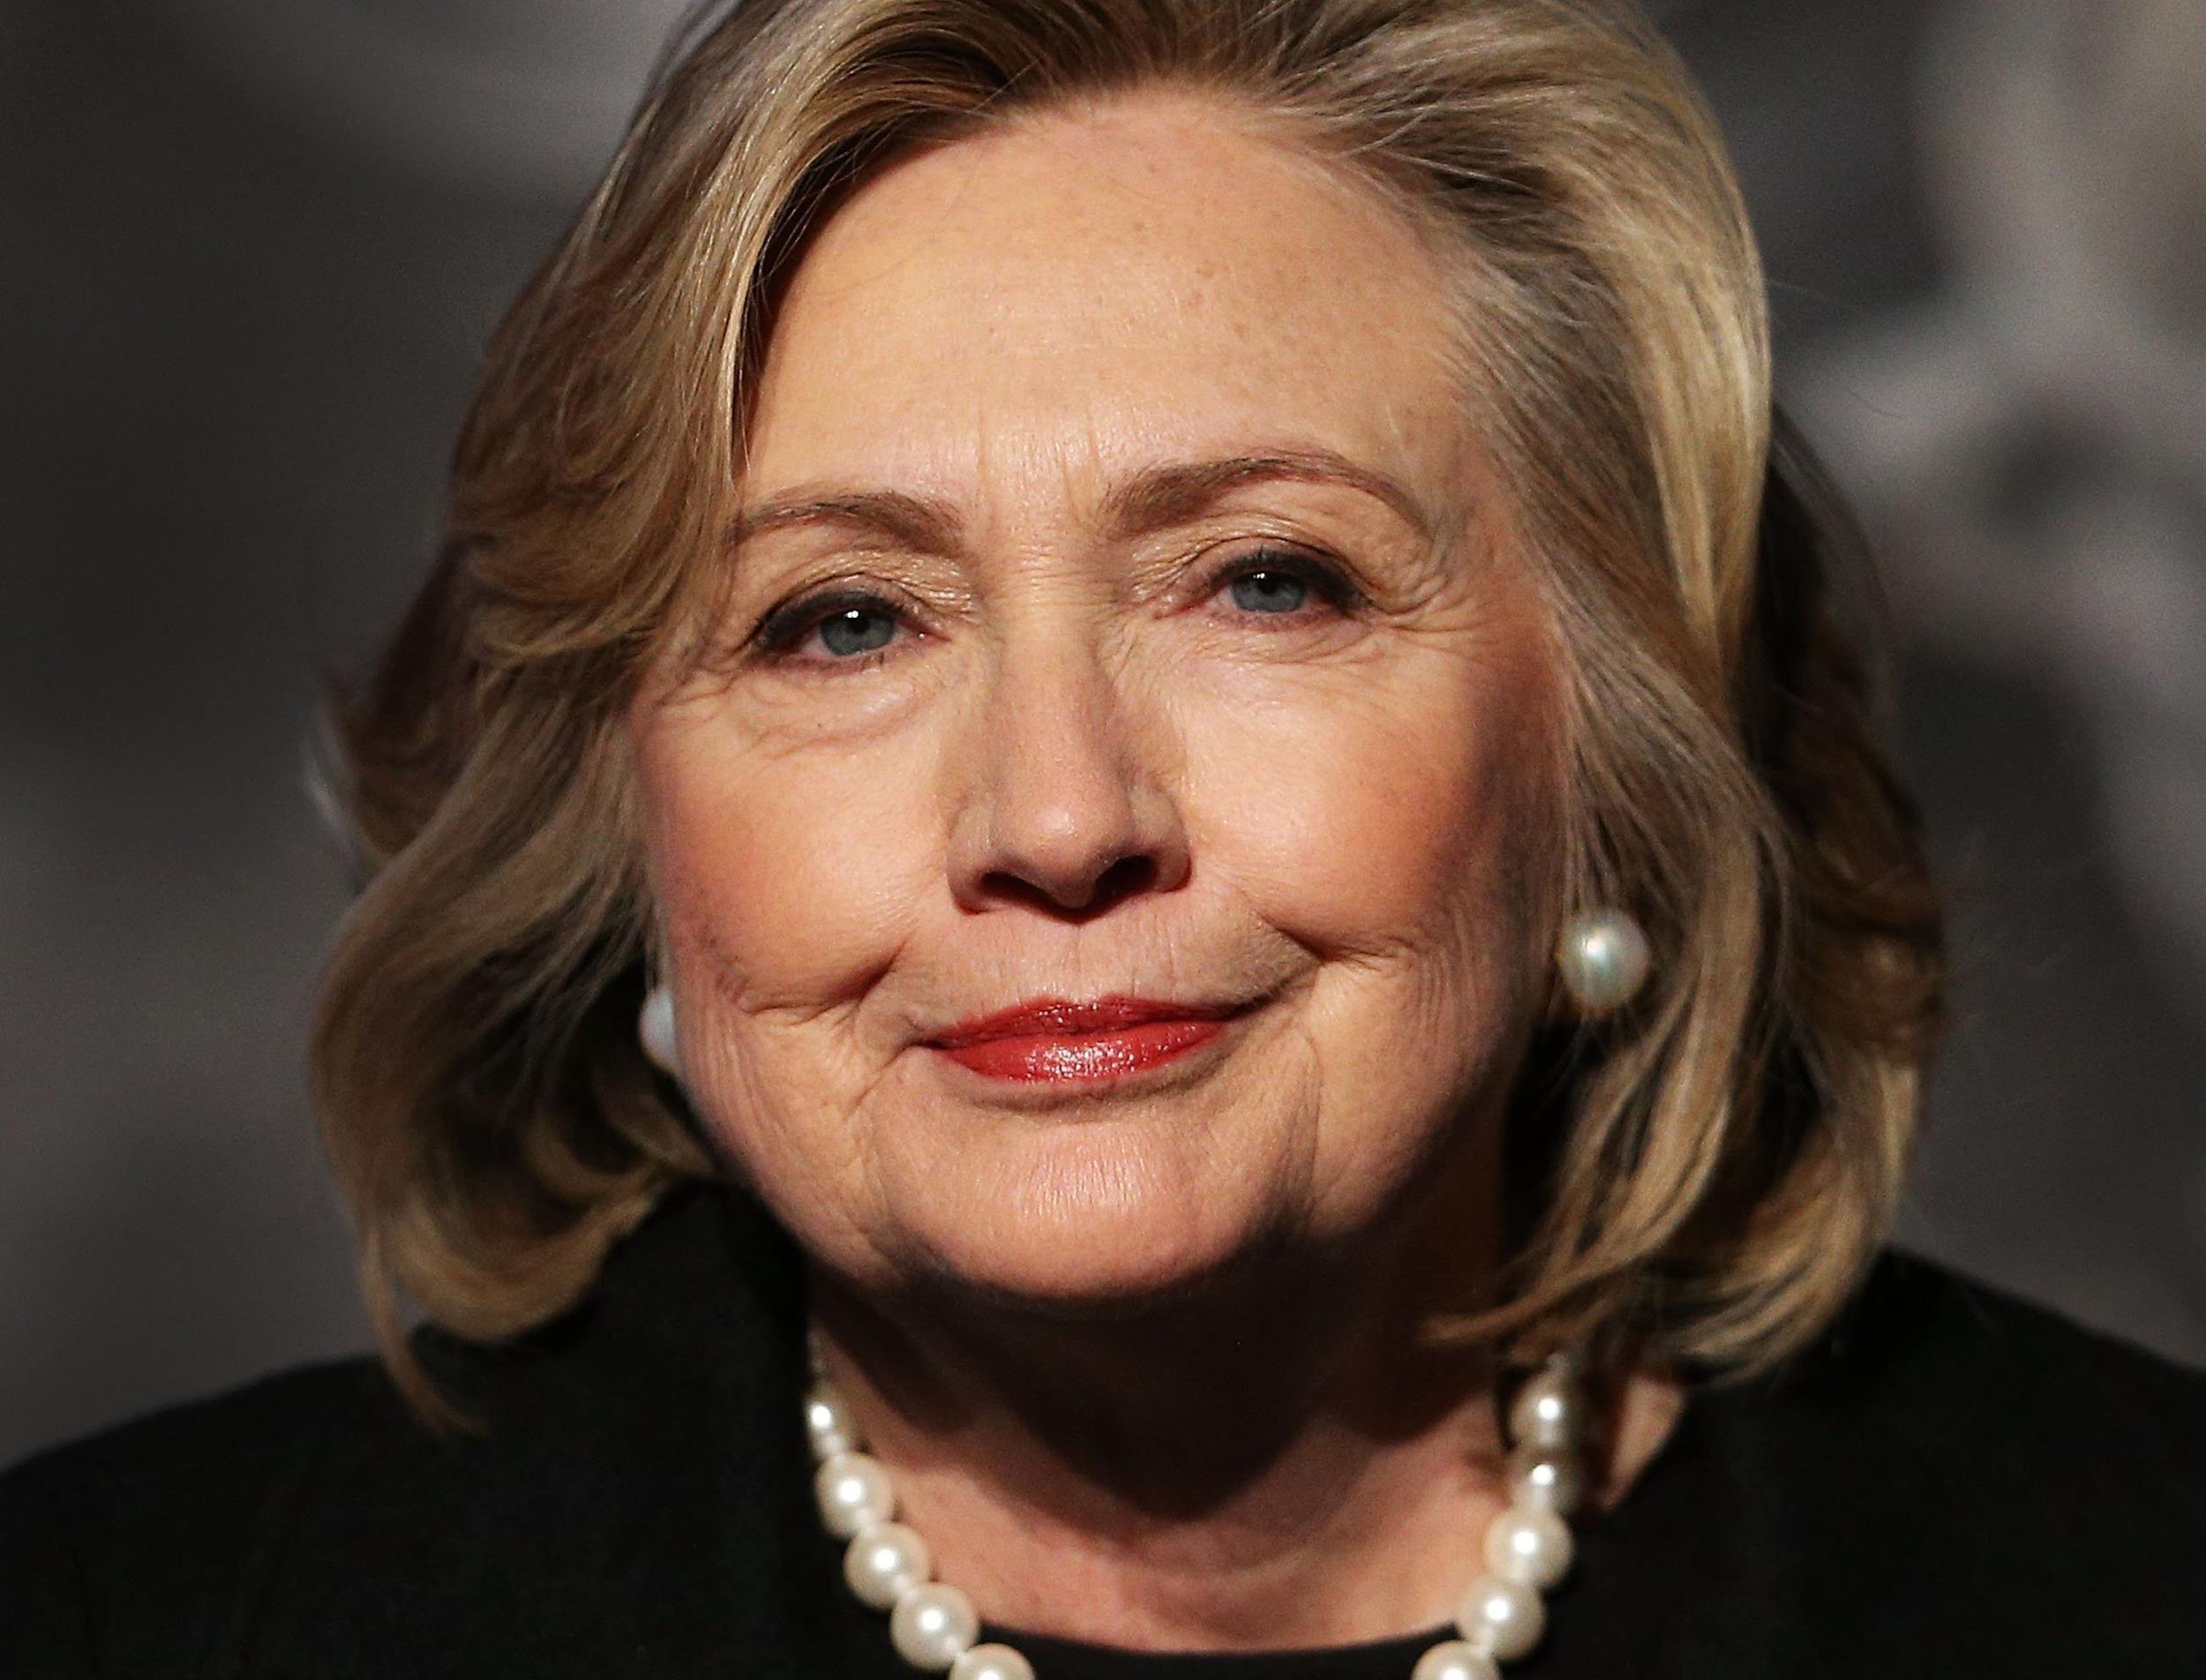 Hillary Clinton Wallpaper HD